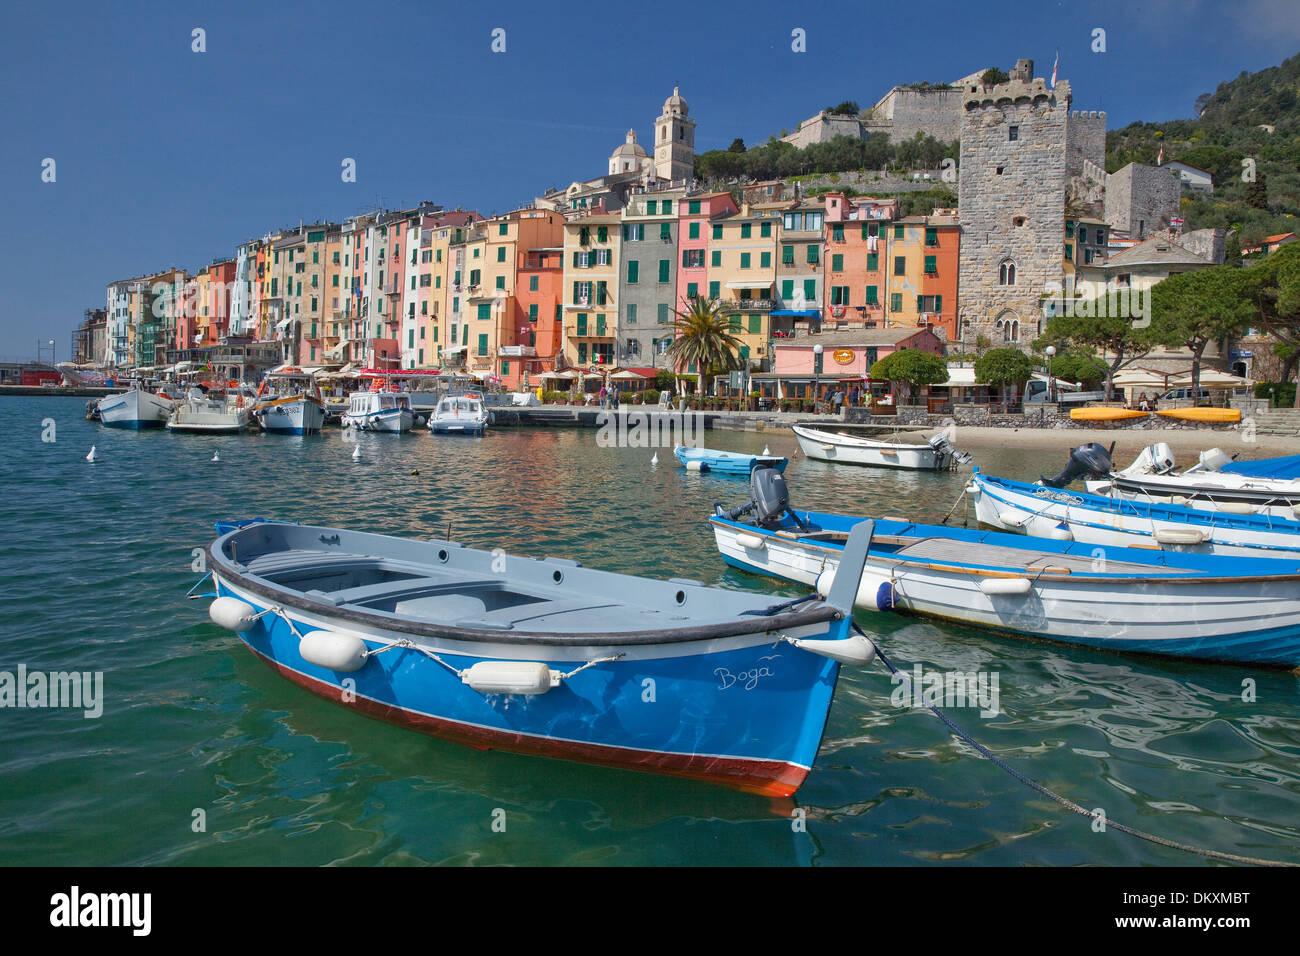 Europe, village, sea, Portovenere, boats, Italy, UNESCO, world heritage, coast, Cinqueterre, Mediterranean, Sea, - Stock Image